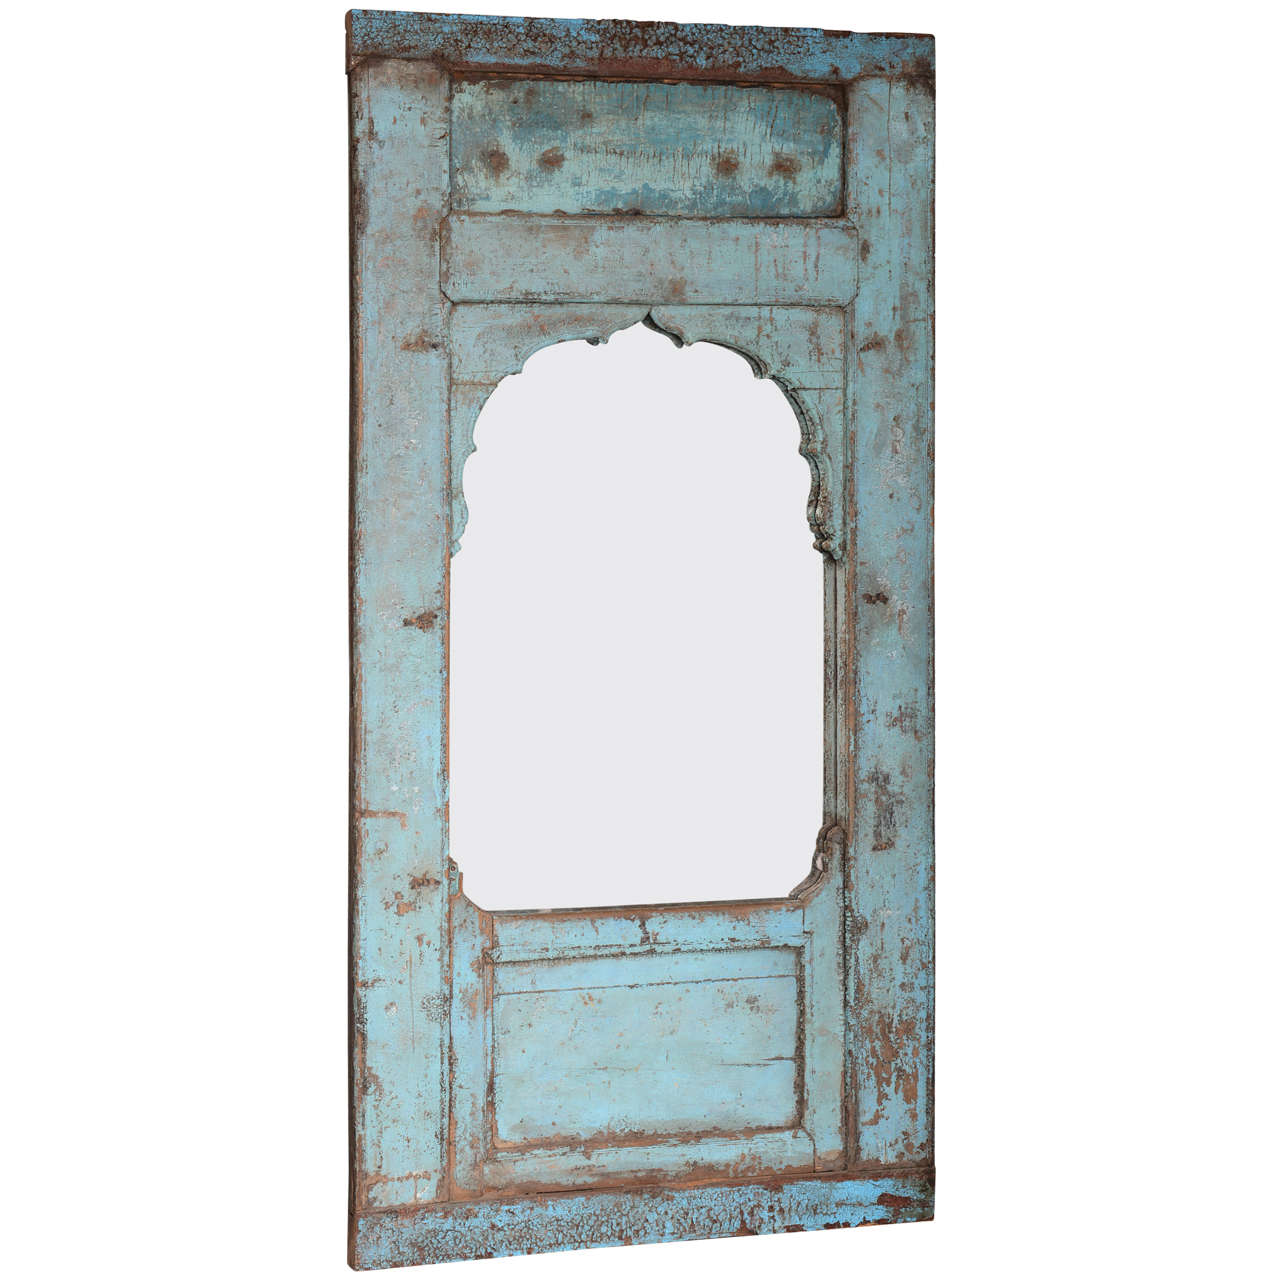 SALE! SALE! SALE!Antique Door Turquoise, full length Java Enchanting,dramatic For Sale